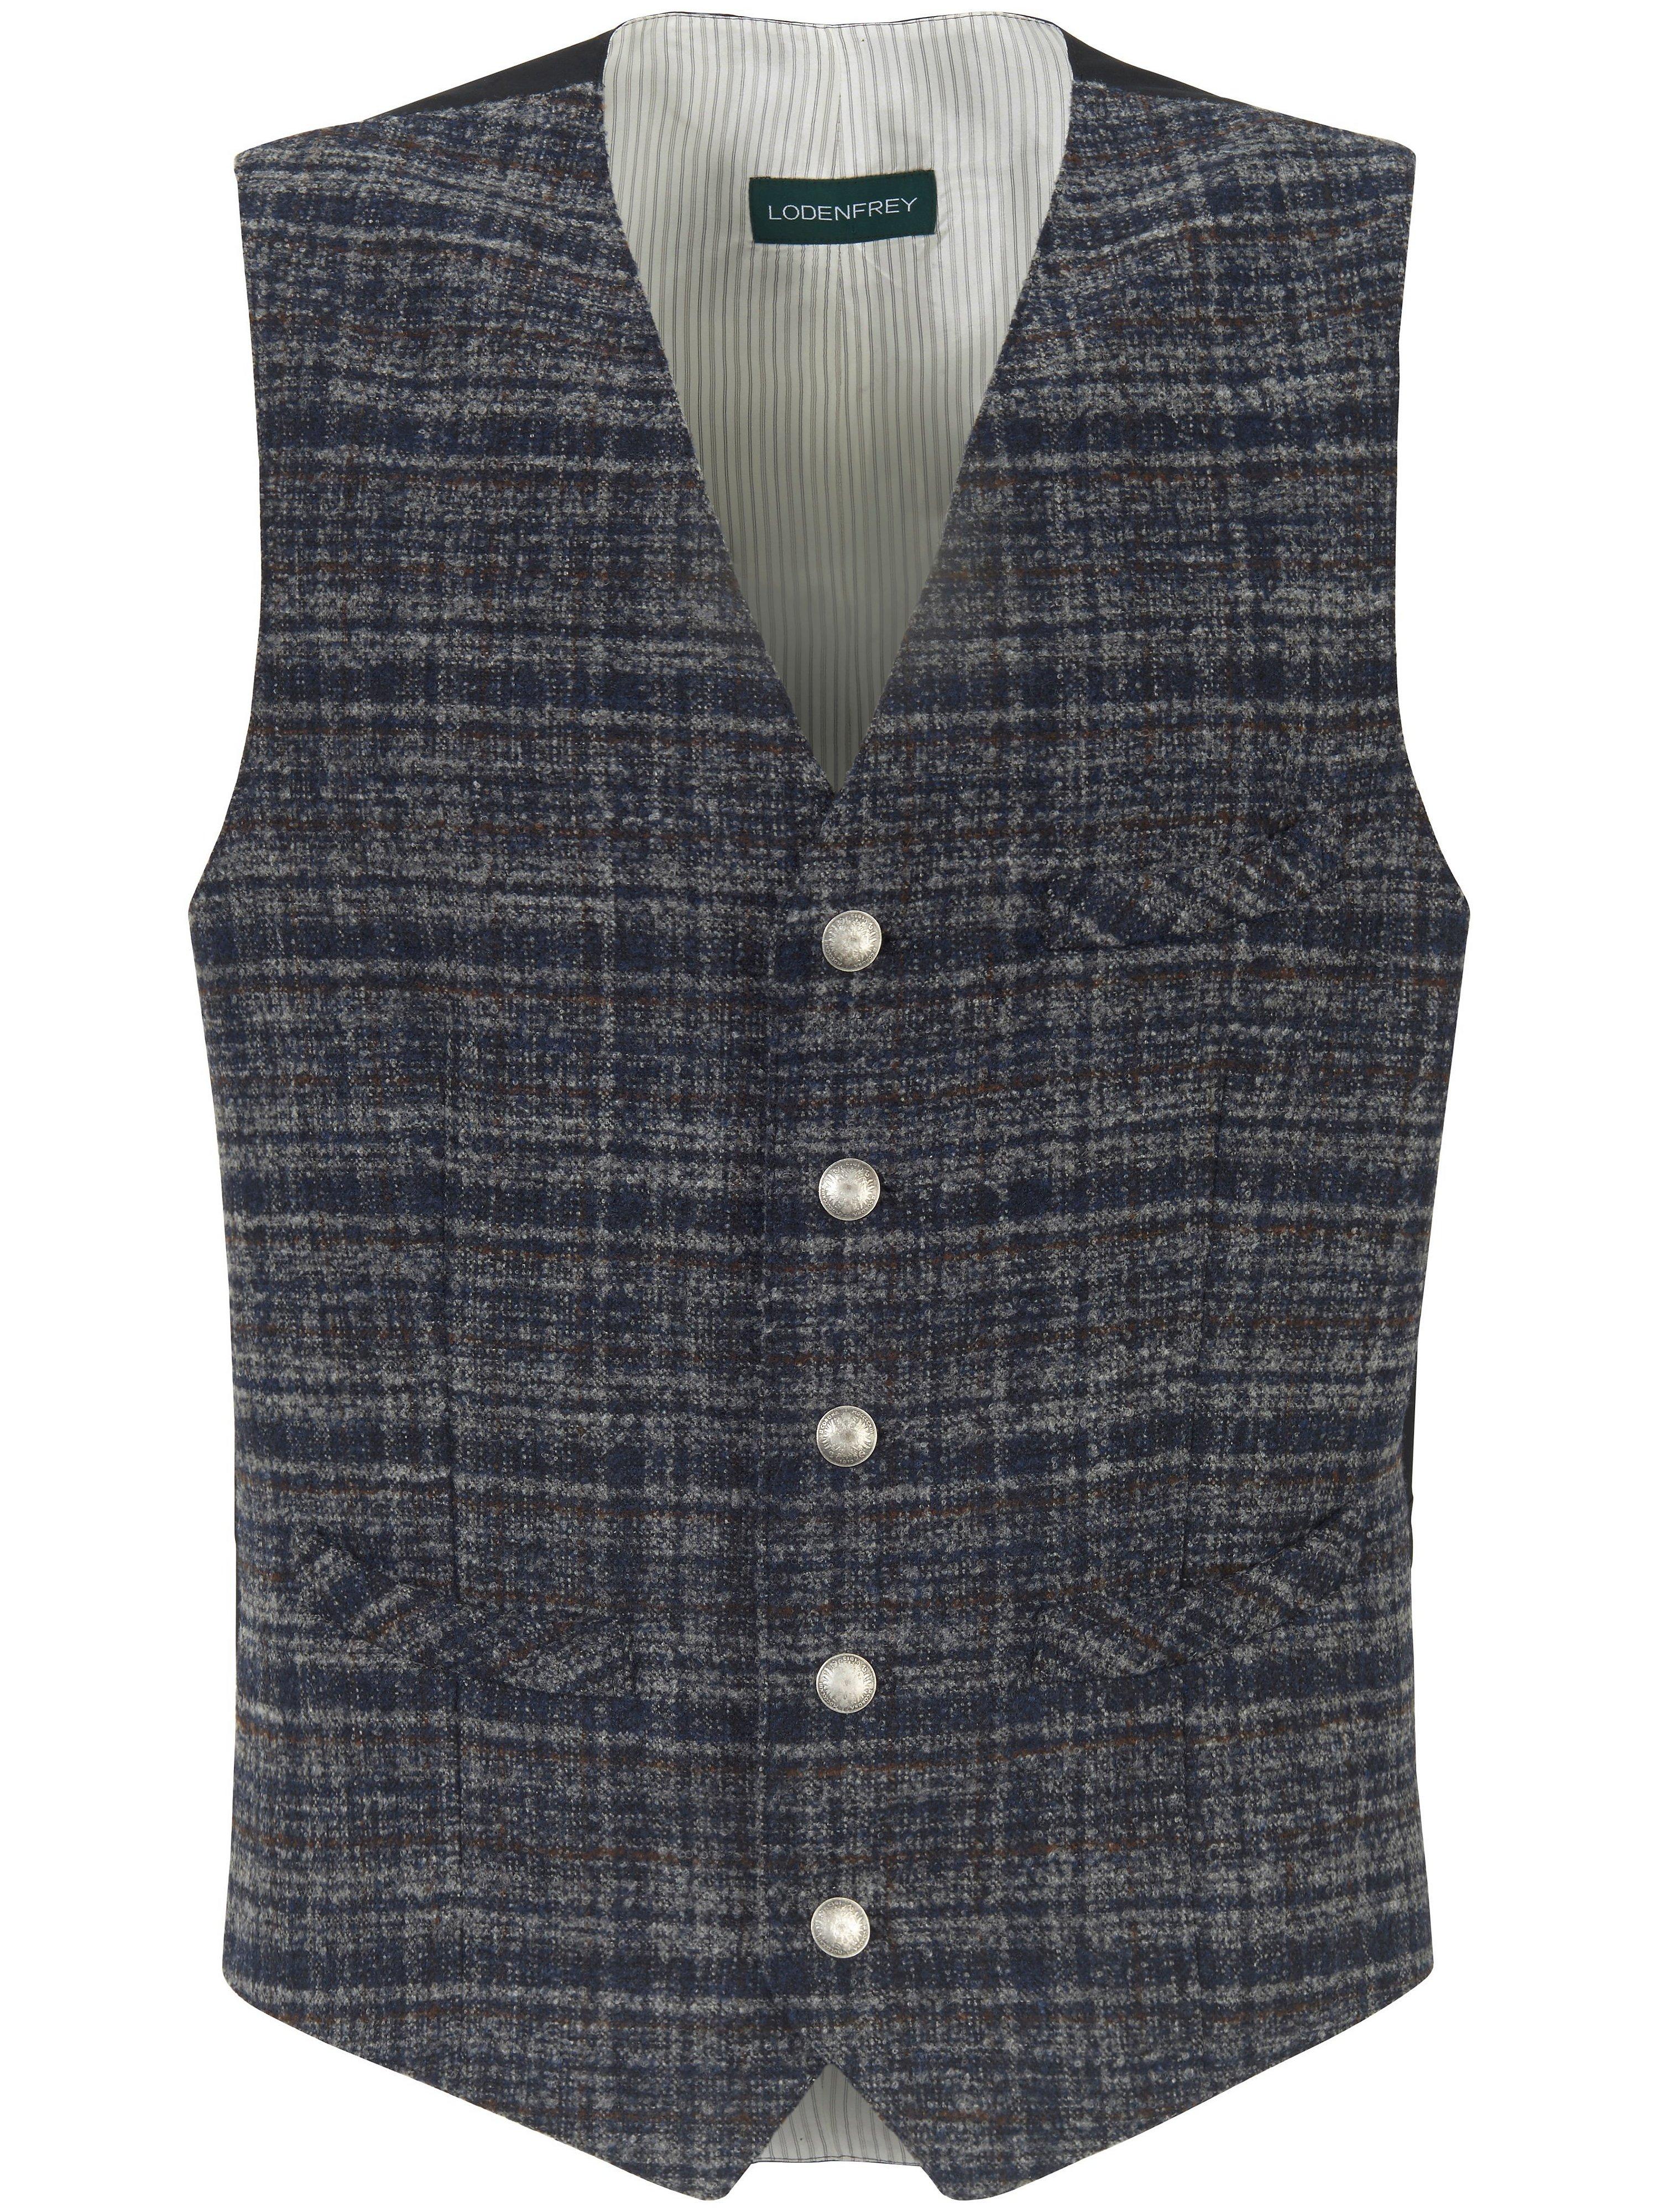 Le gilet costume  Lodenfrey gris taille 54